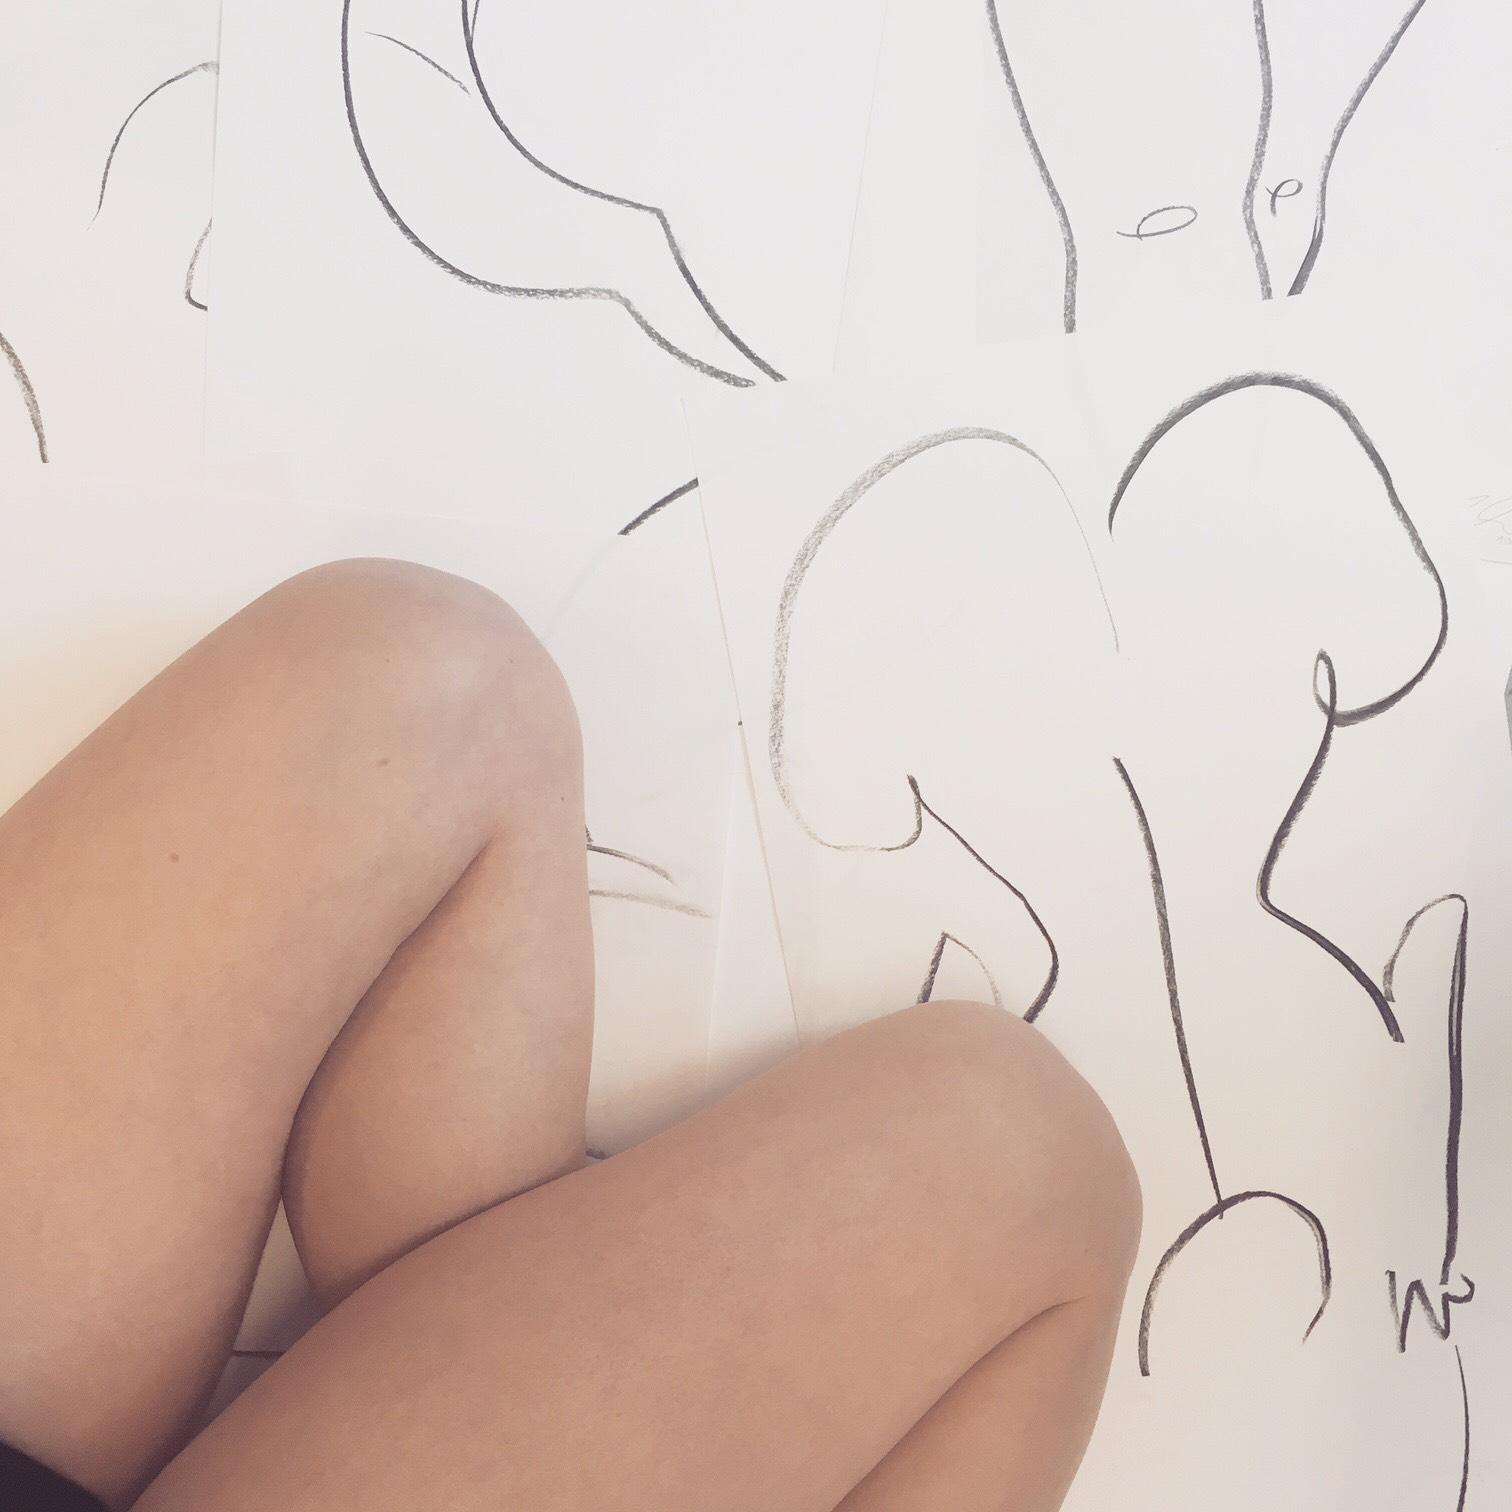 Alexa Life Drawing Class